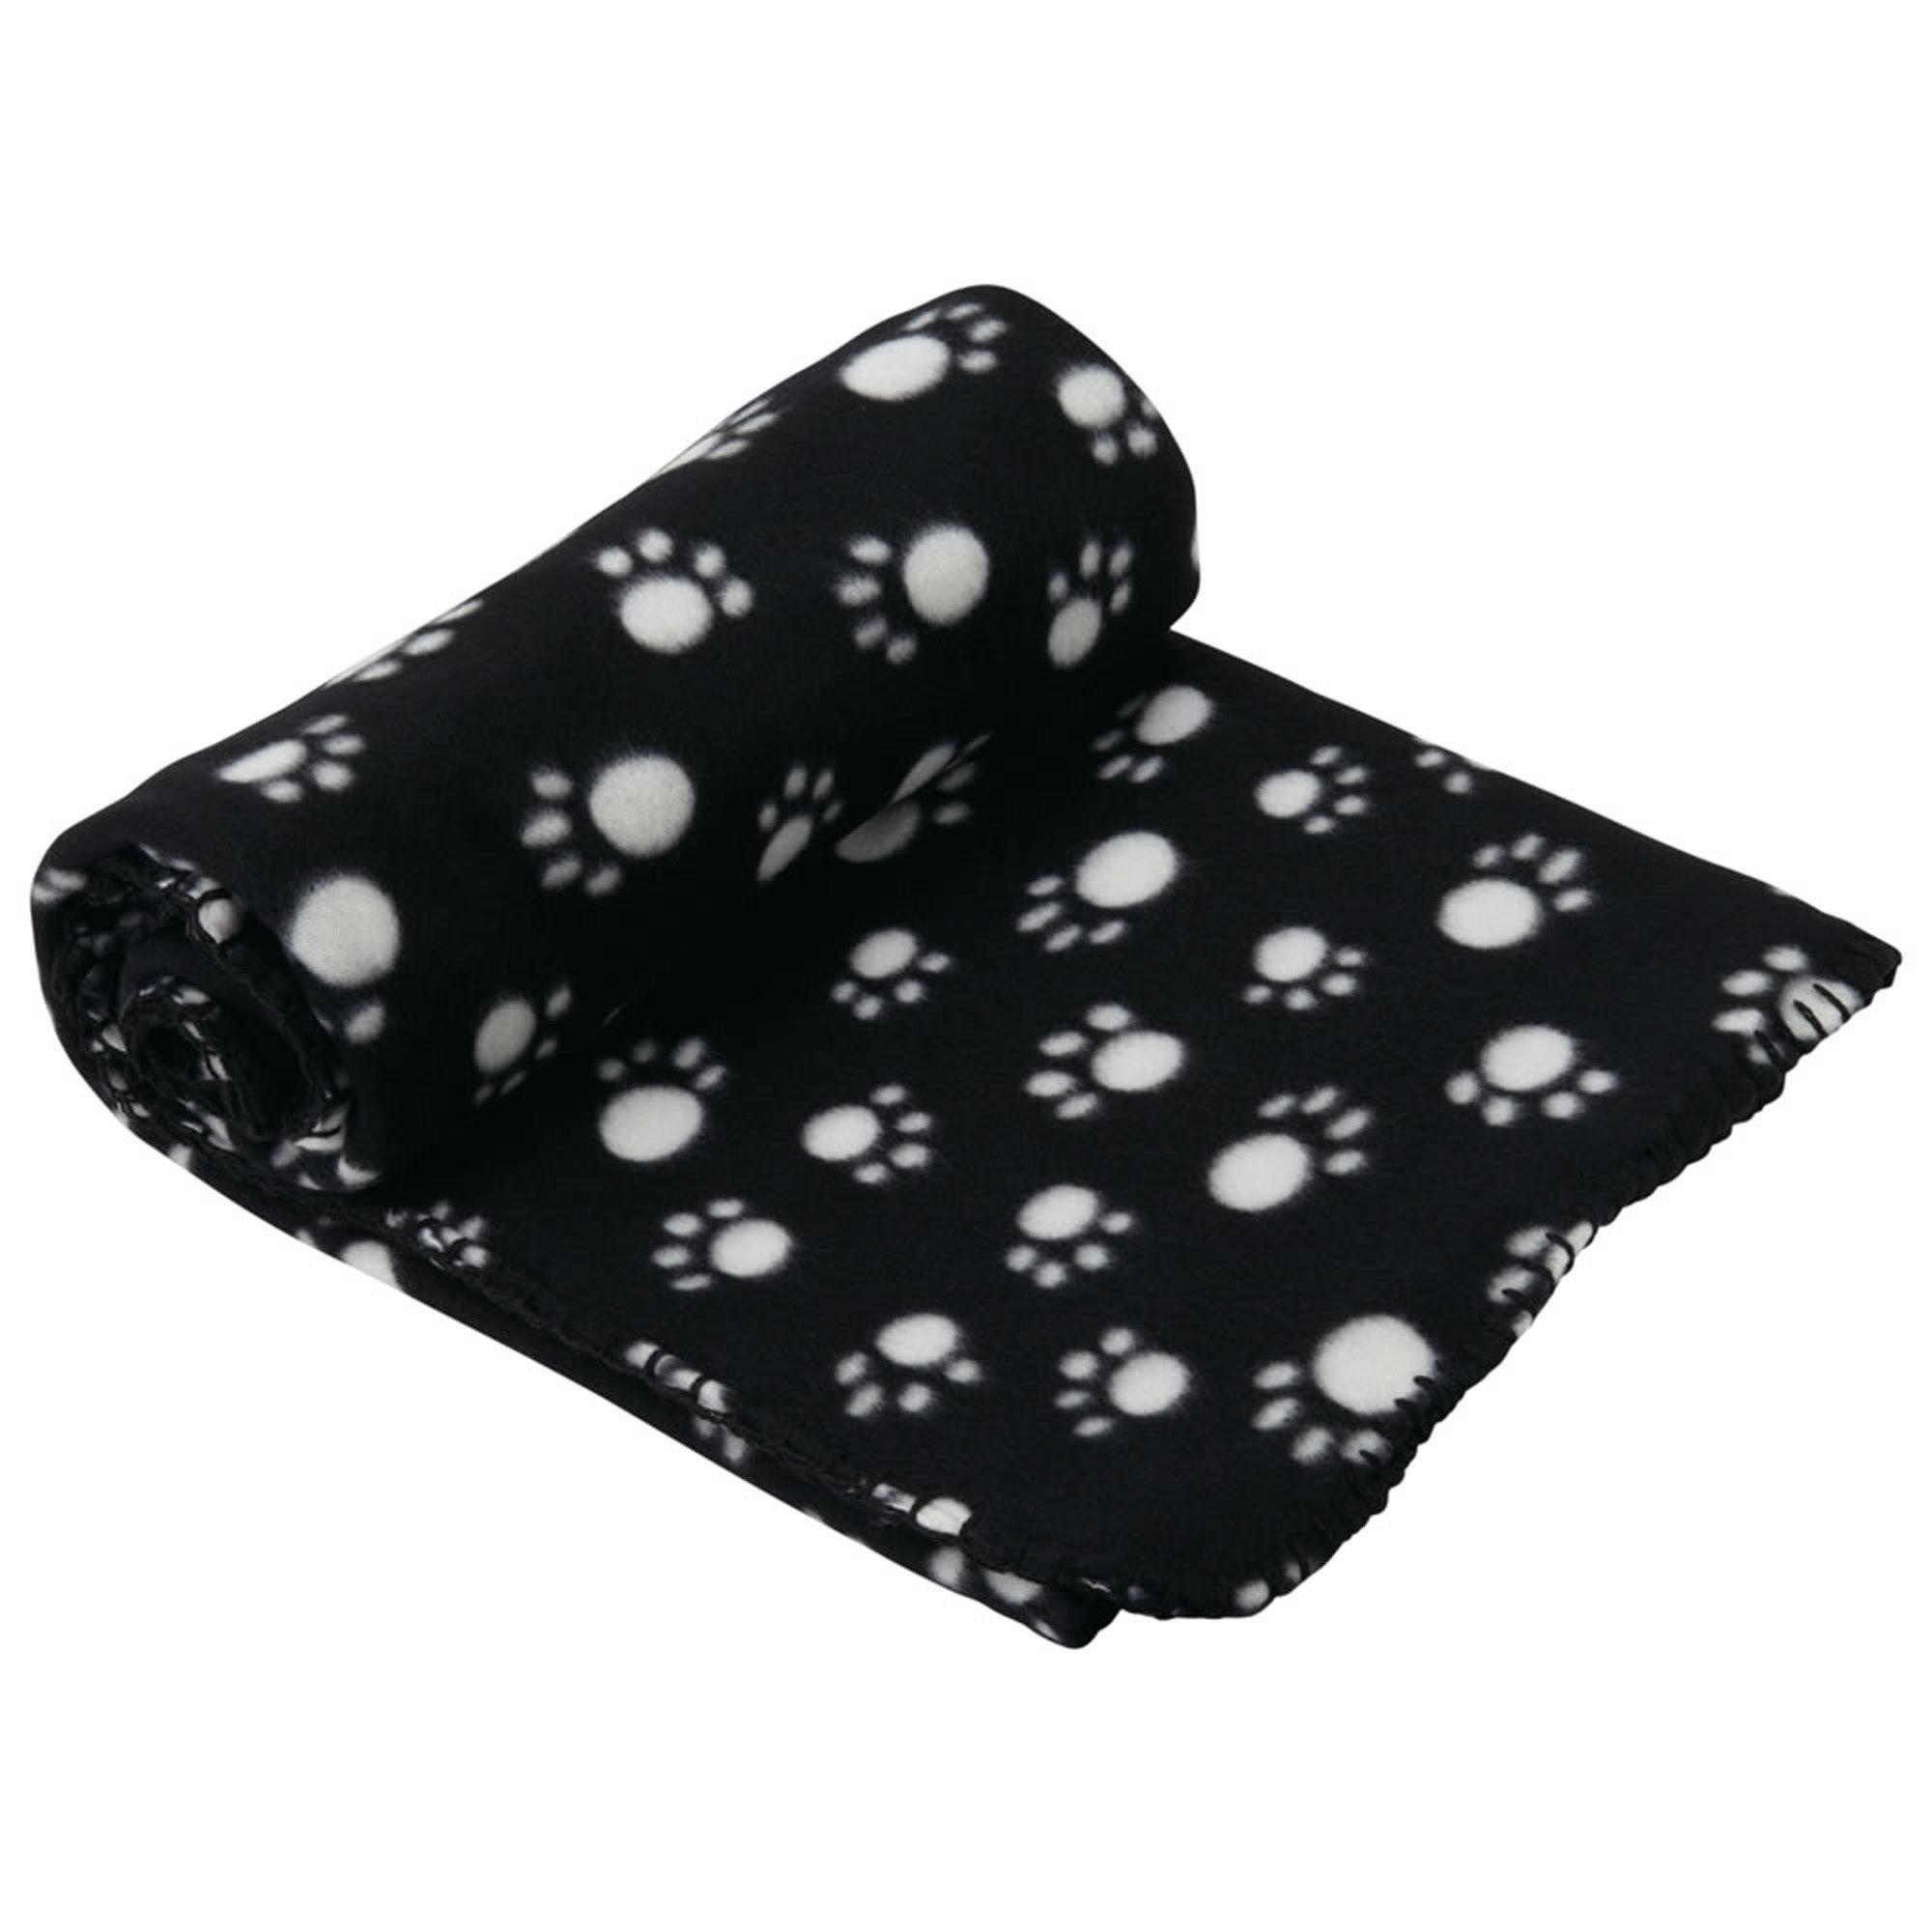 Extra Large Black Dog Blanket Black